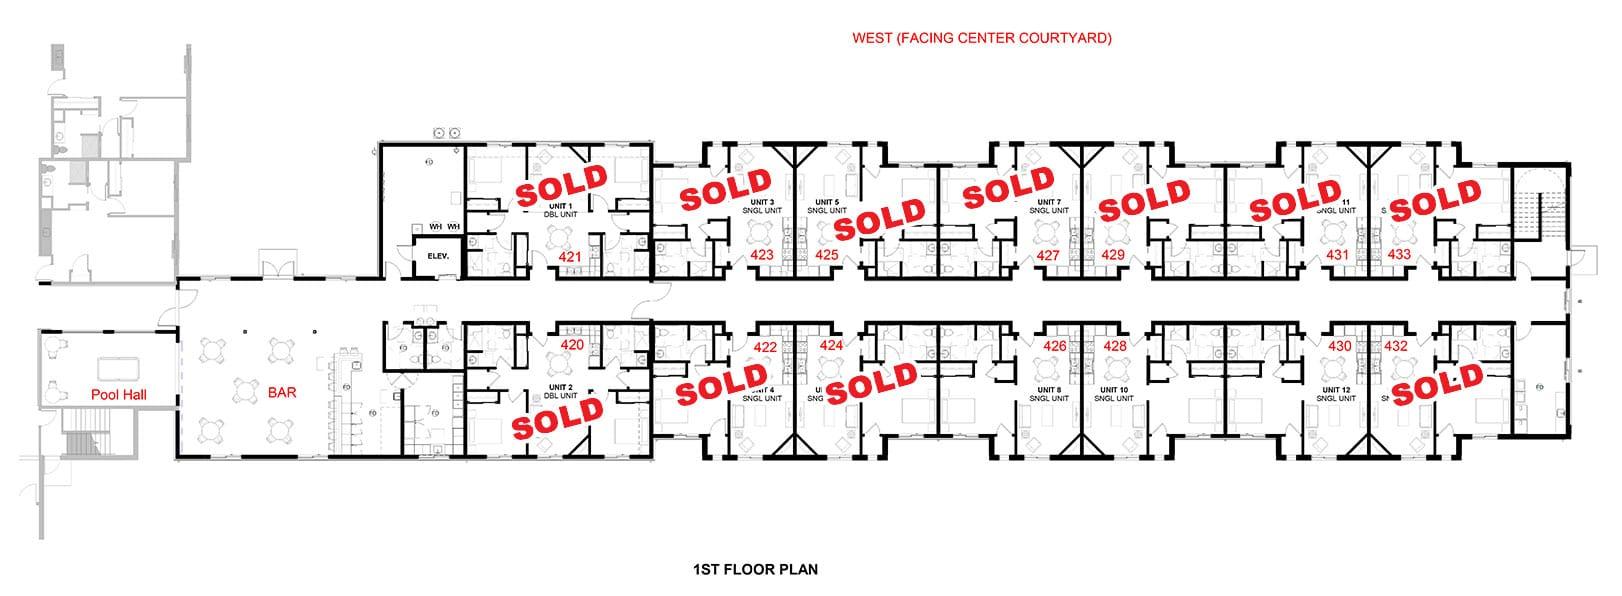 1st-floor-expansion11052019